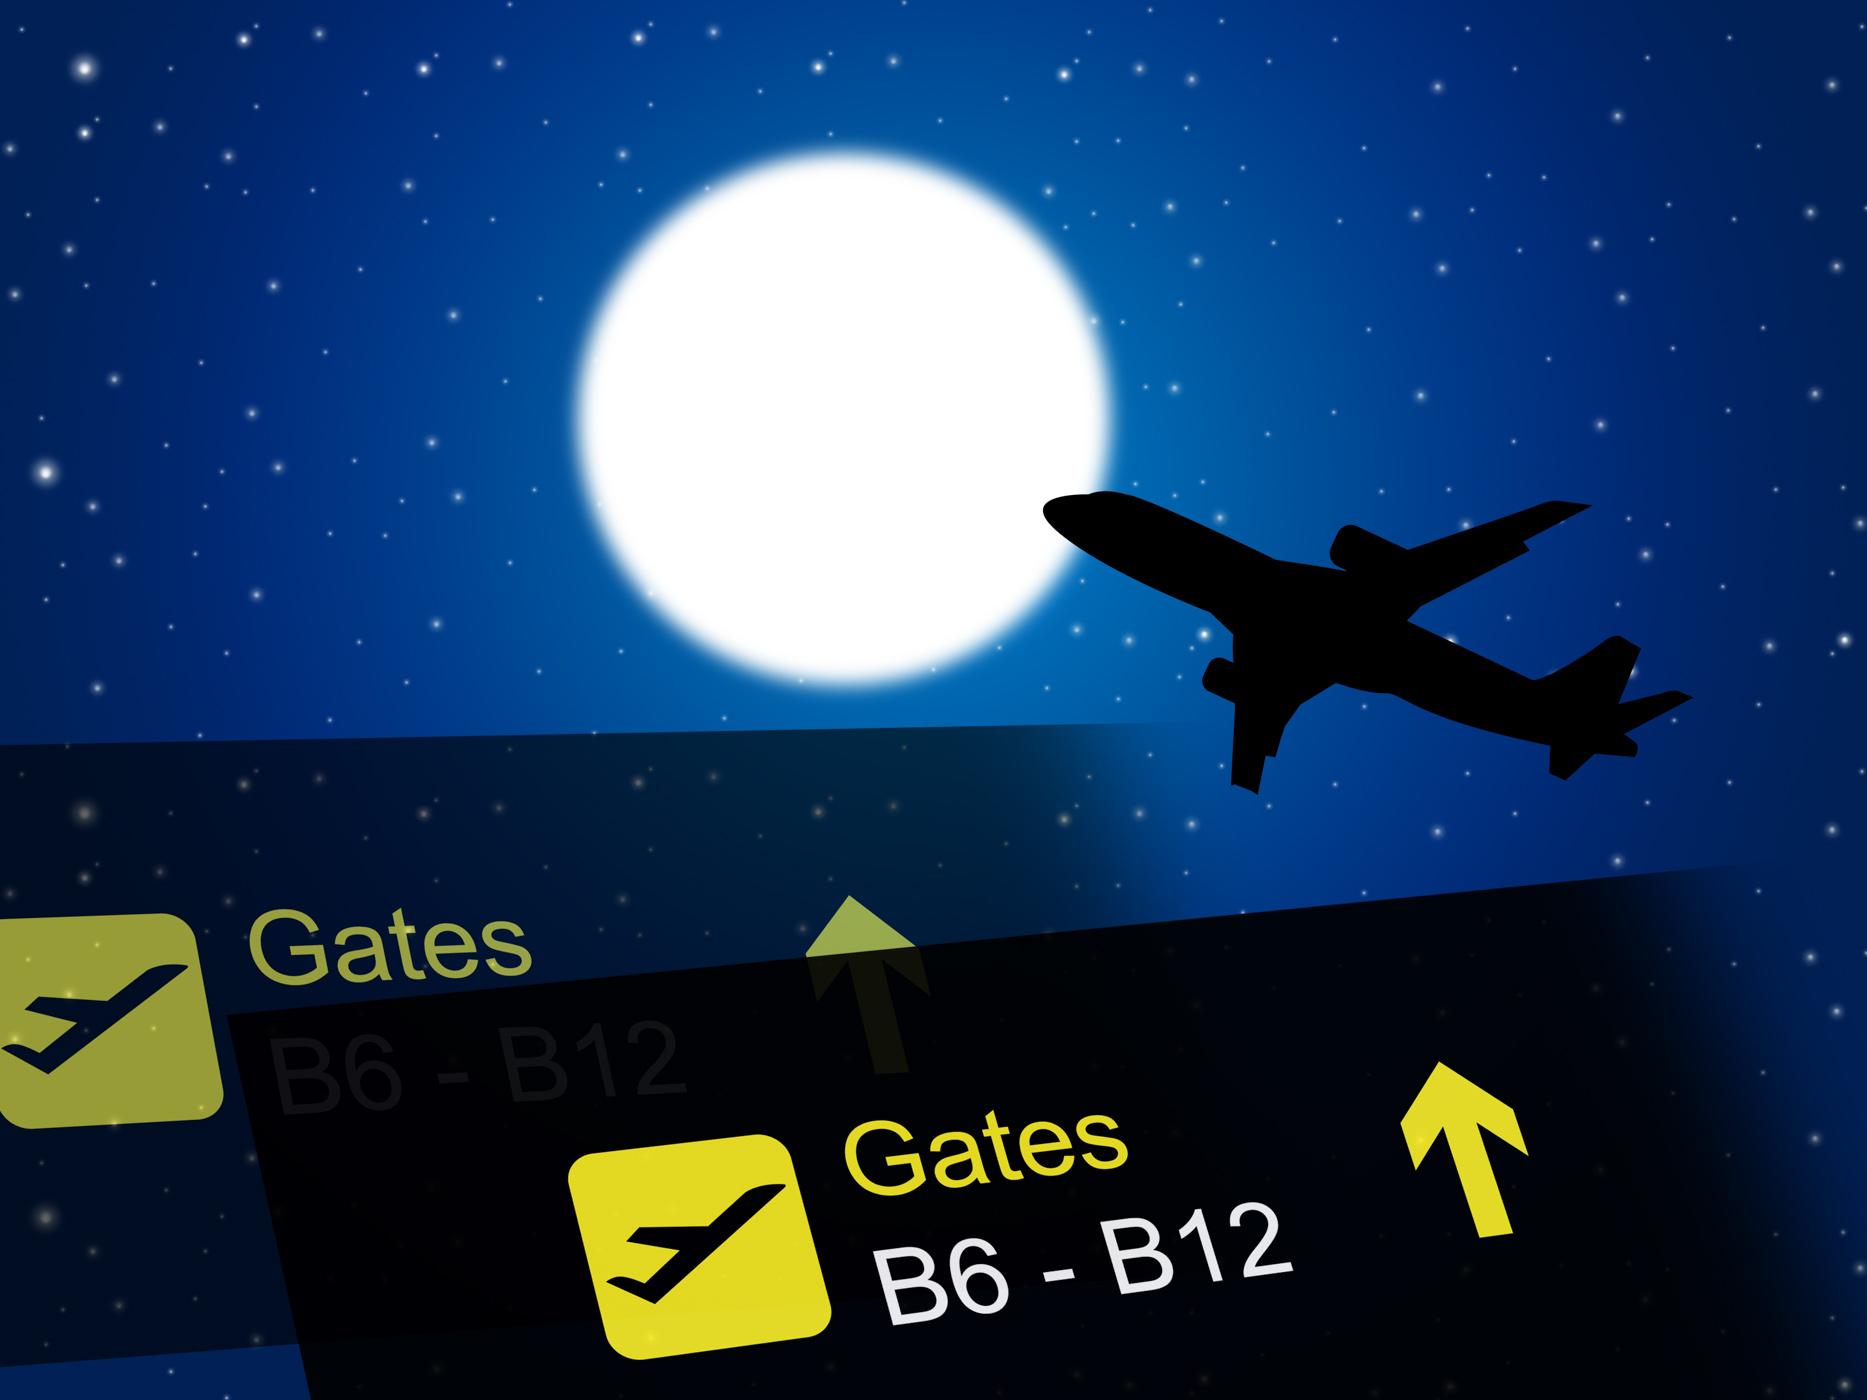 Nighttime flight shows global international and air photo